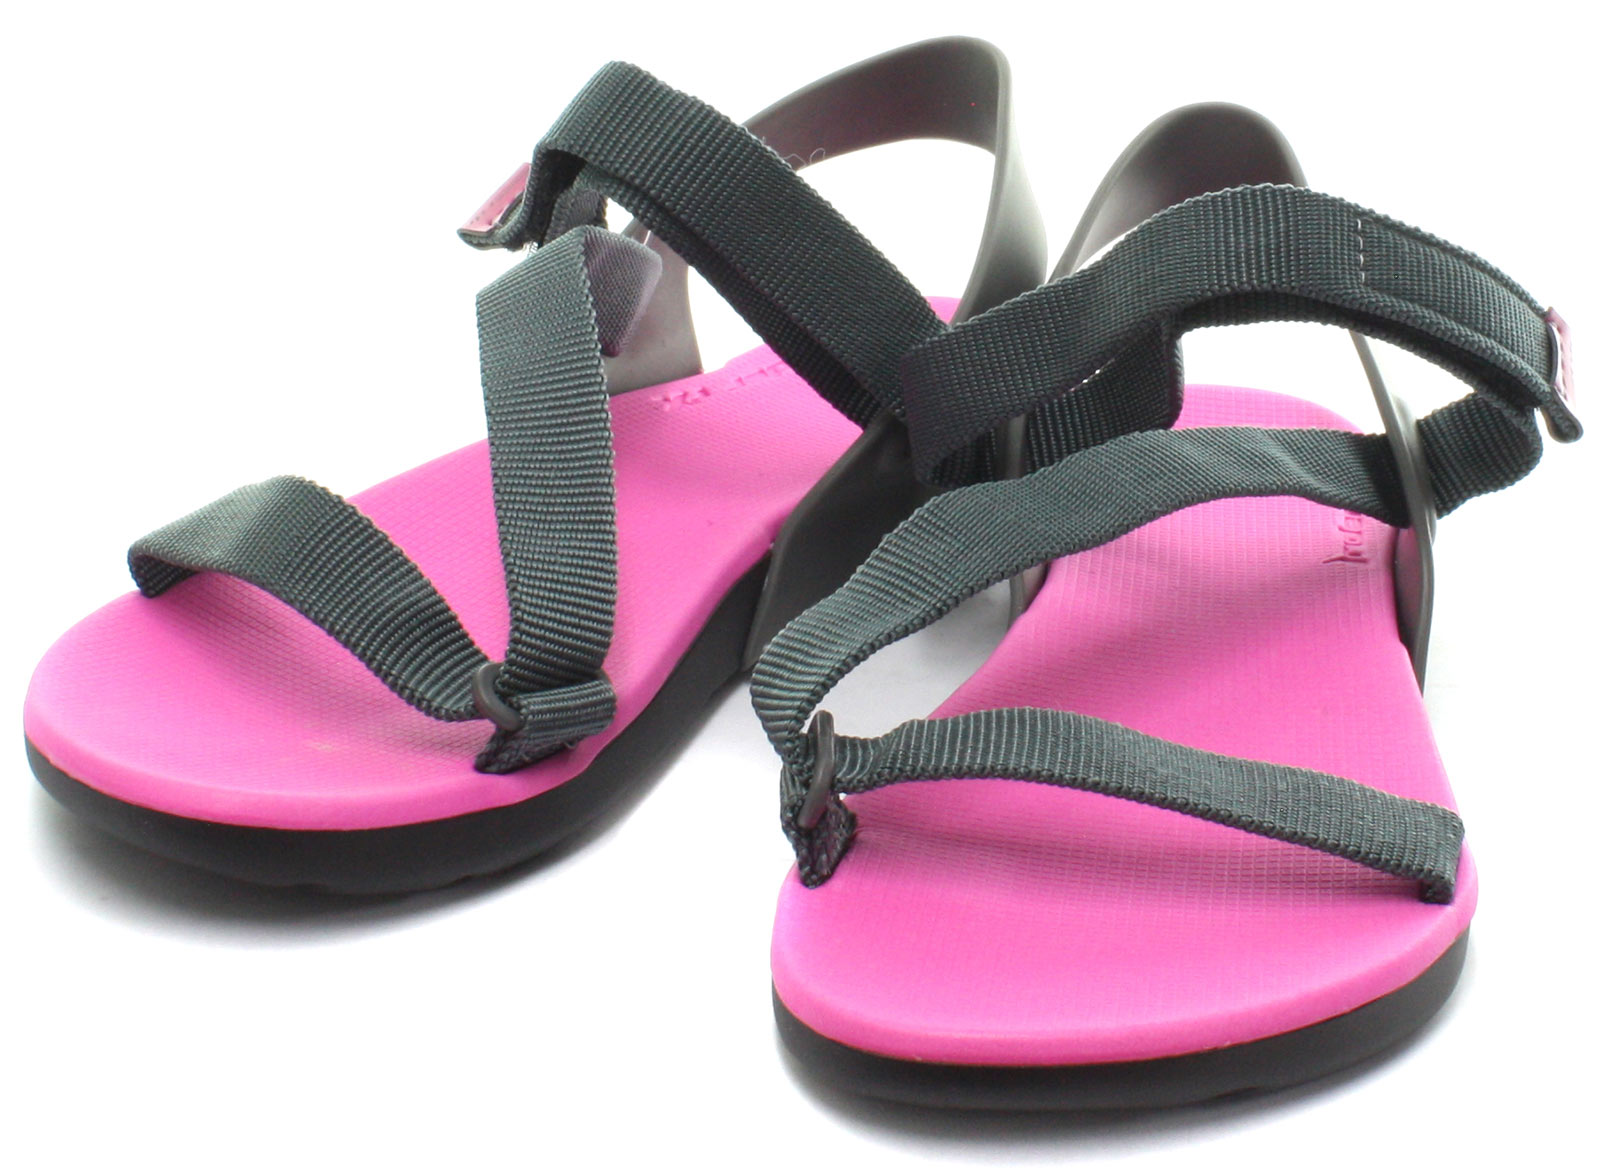 945c961681b199 New Rider Brasil RX Fem Womens Sandals ALL SIZES